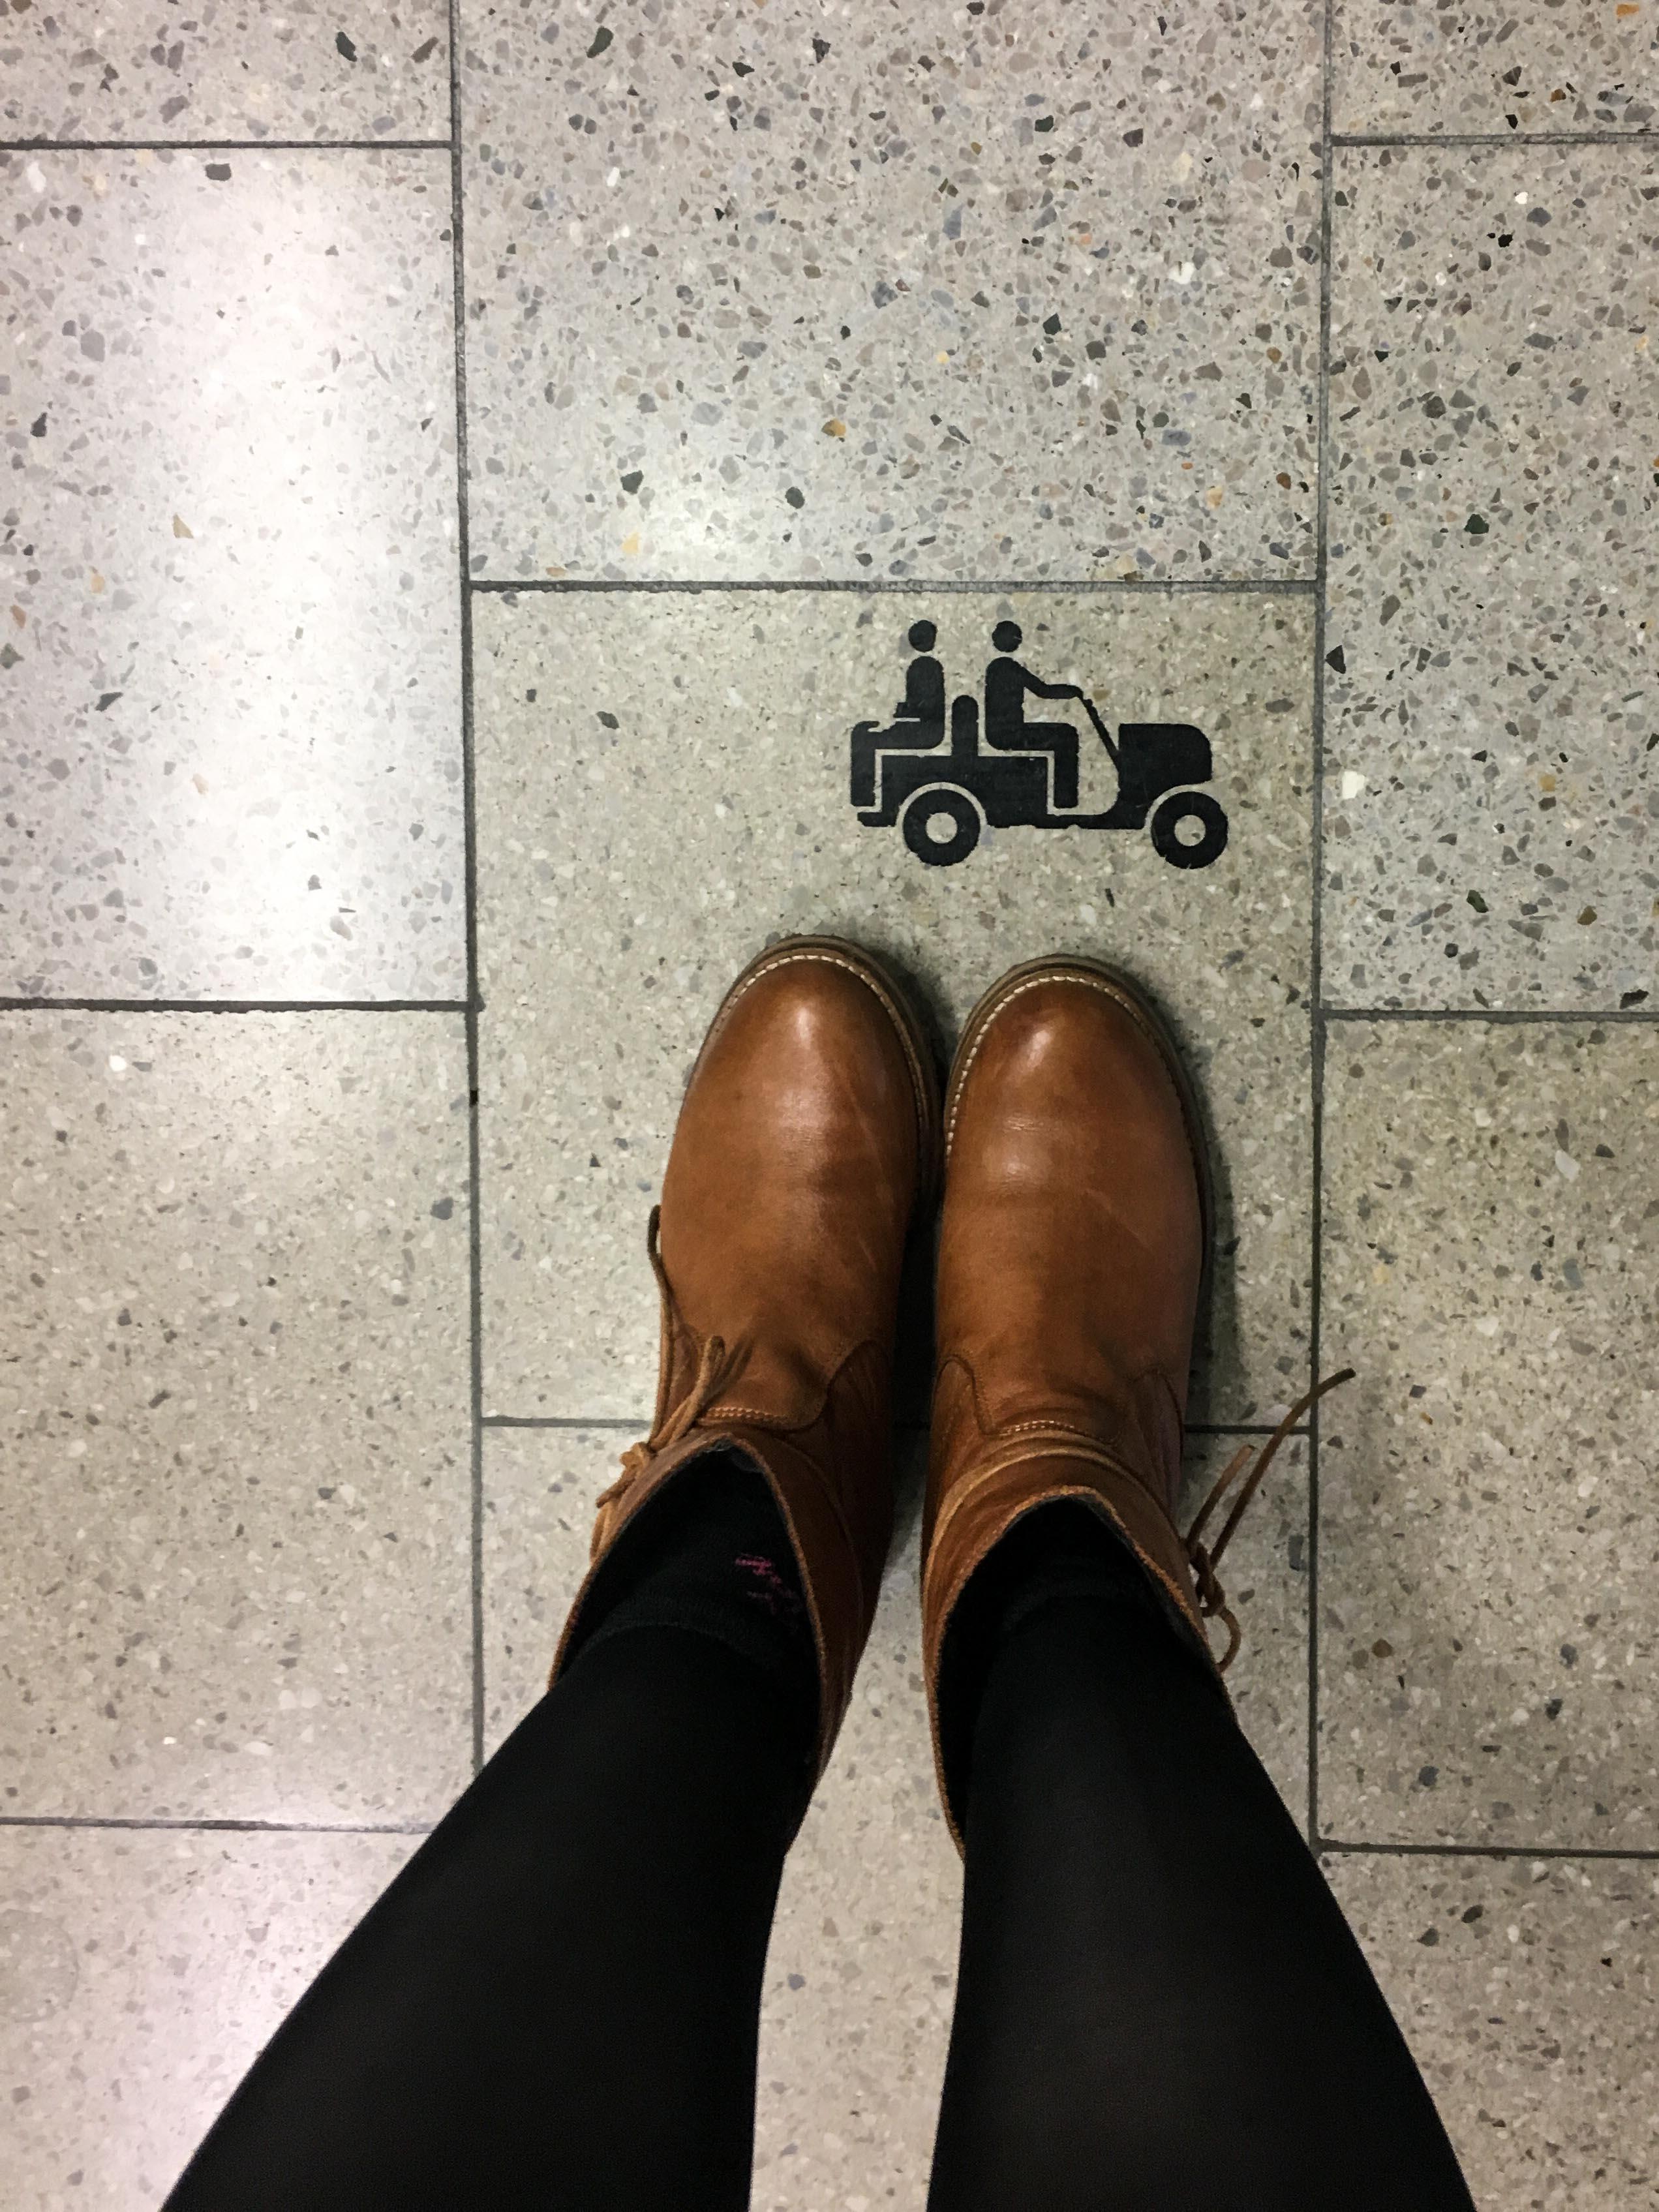 Piktogram am Zürcher Flughafen